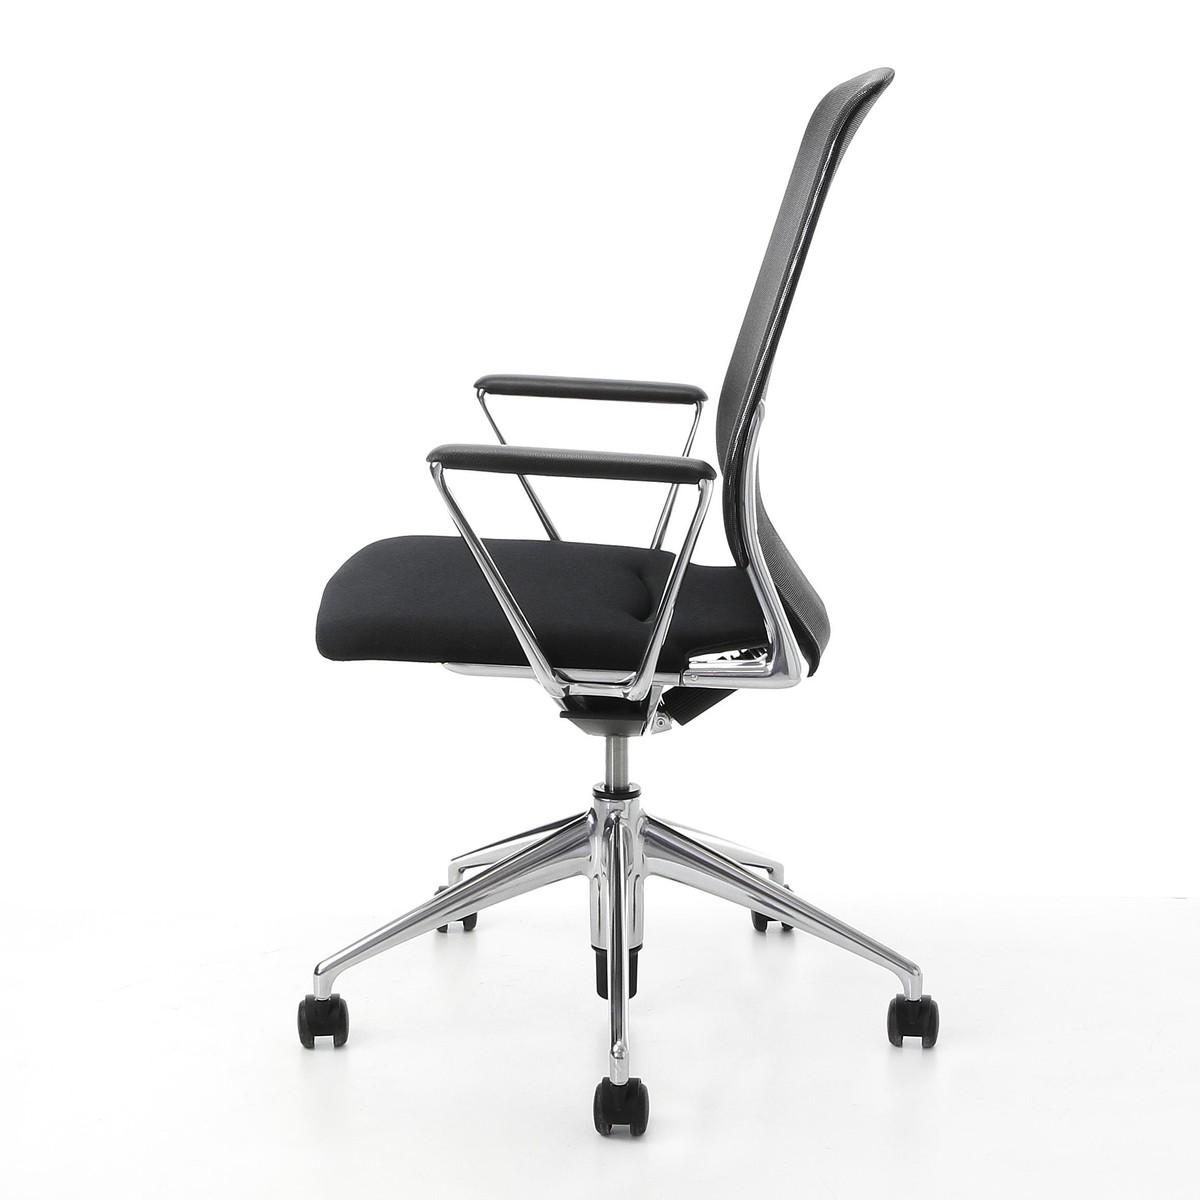 vitra meda chair chaise de bureau vitra. Black Bedroom Furniture Sets. Home Design Ideas